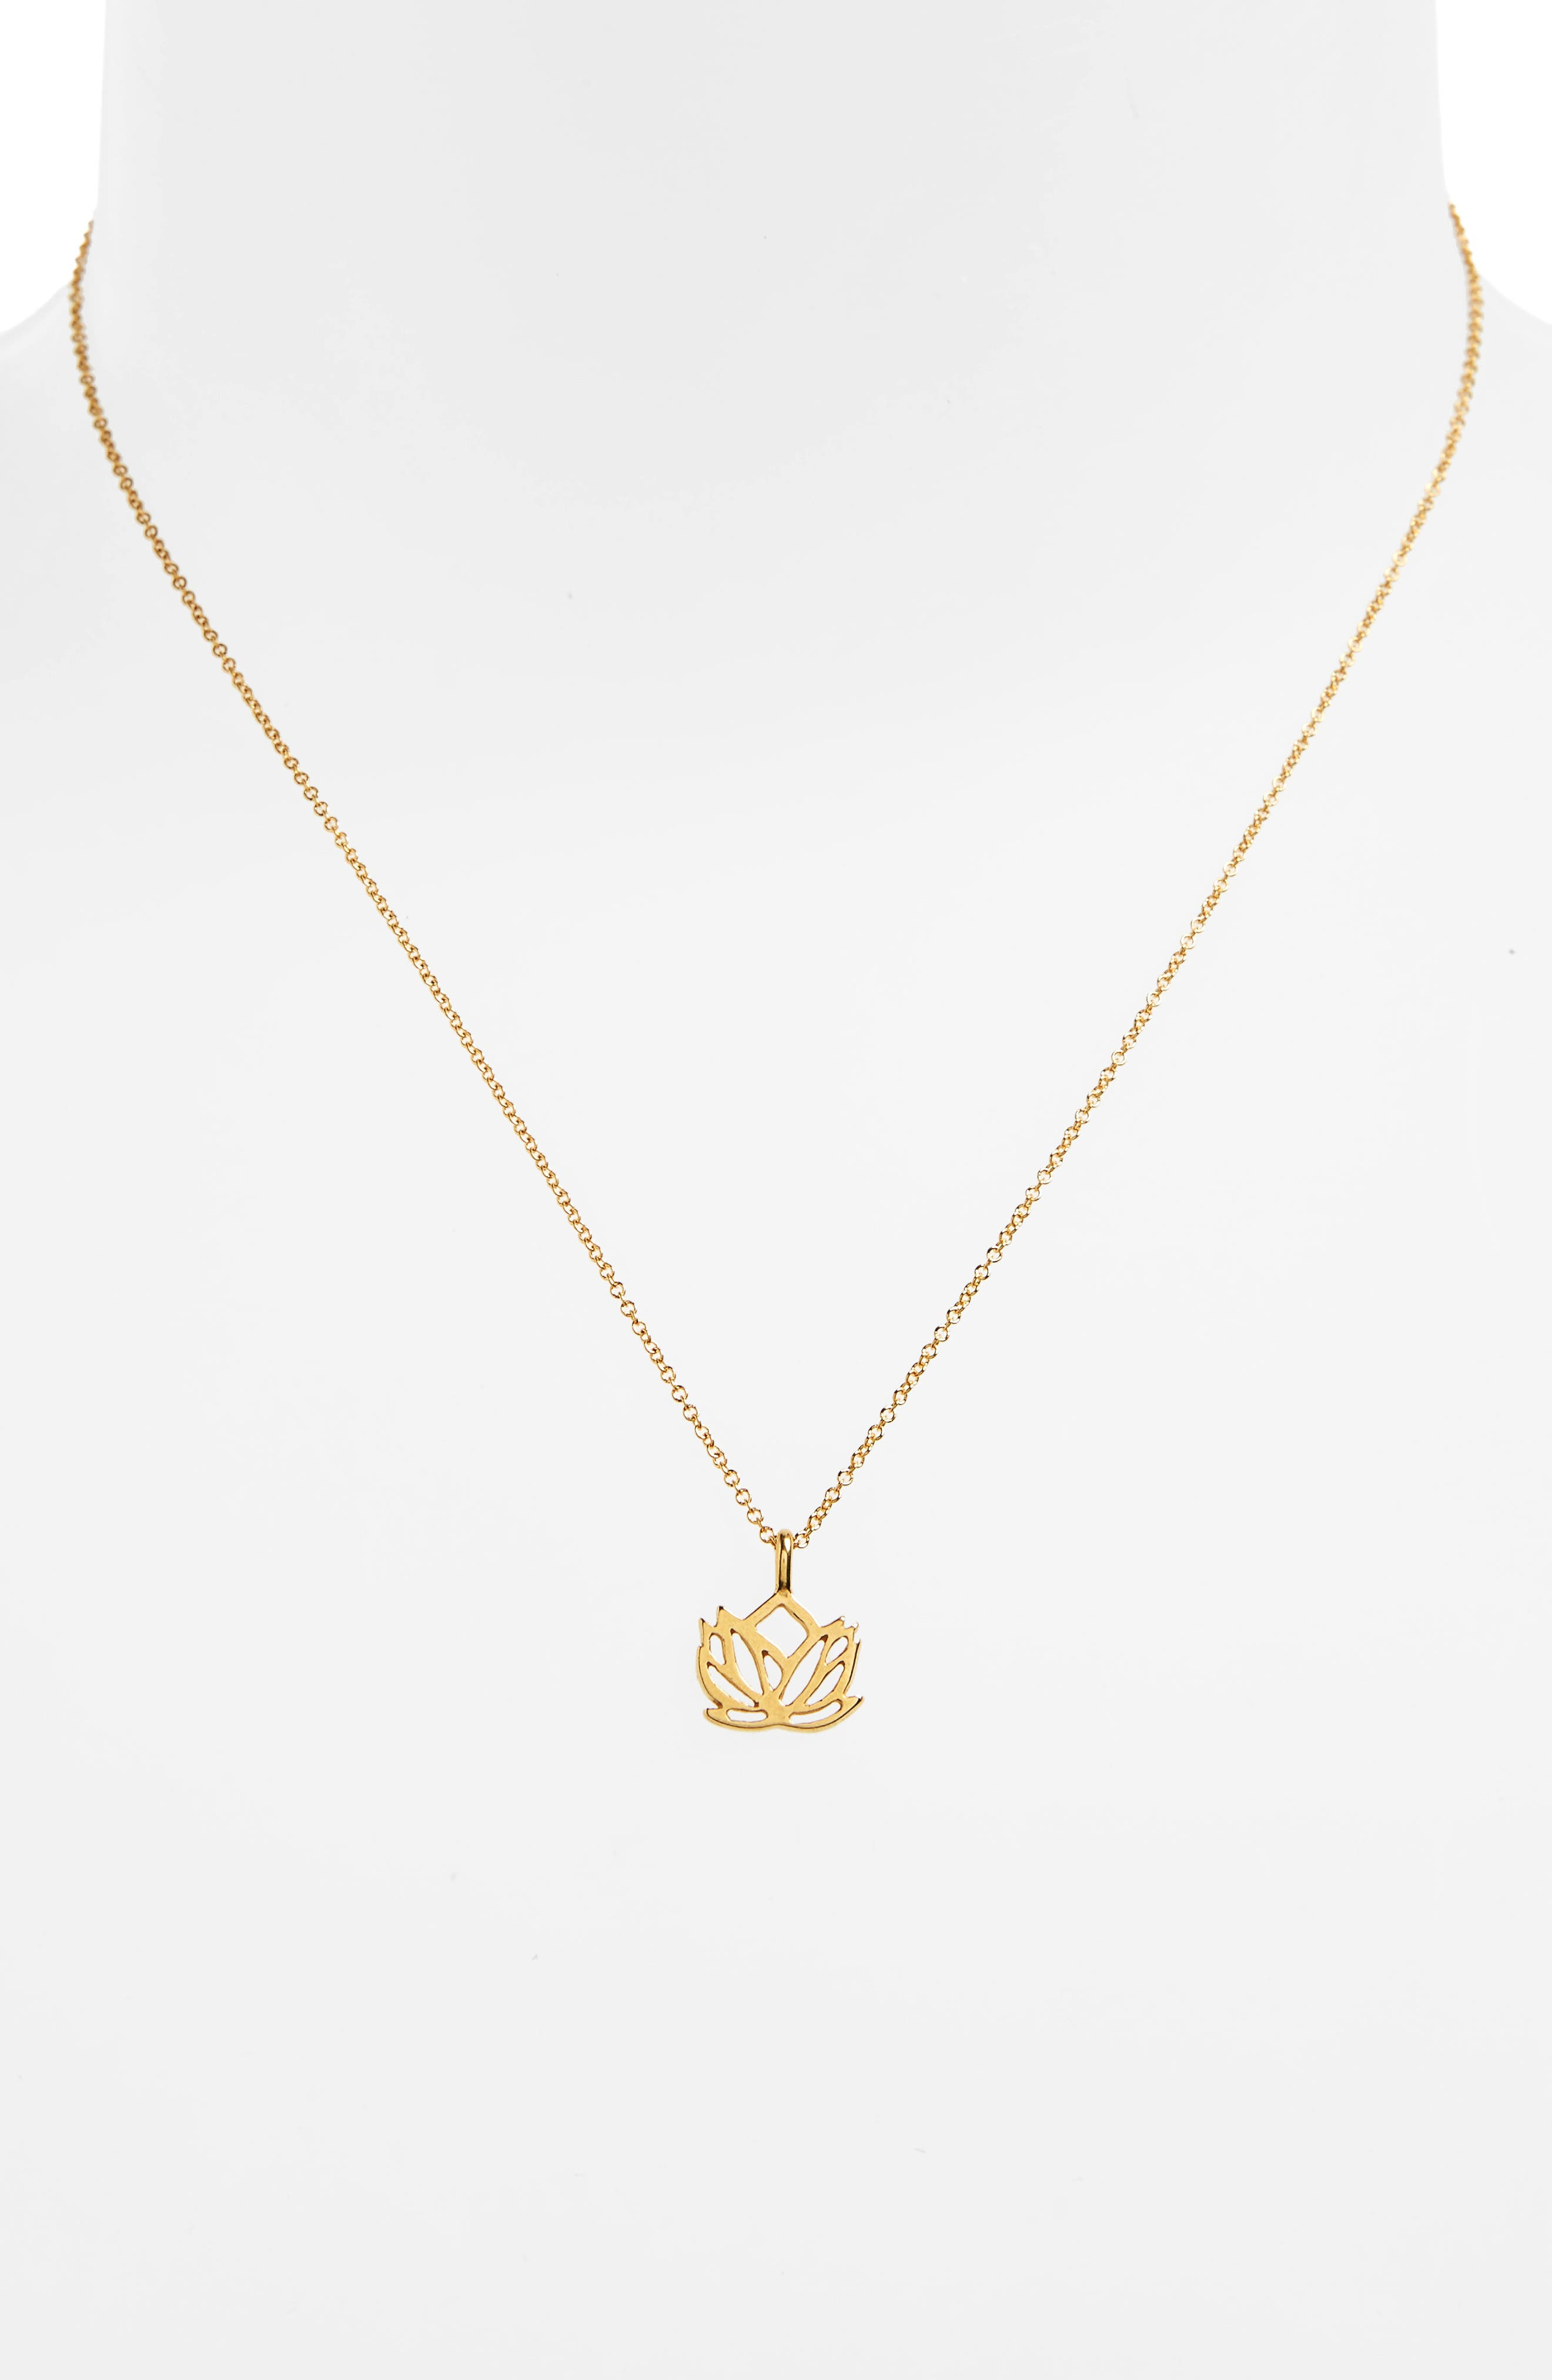 Lotus Reminder Pendant Necklace,                             Alternate thumbnail 3, color,                             GOLD